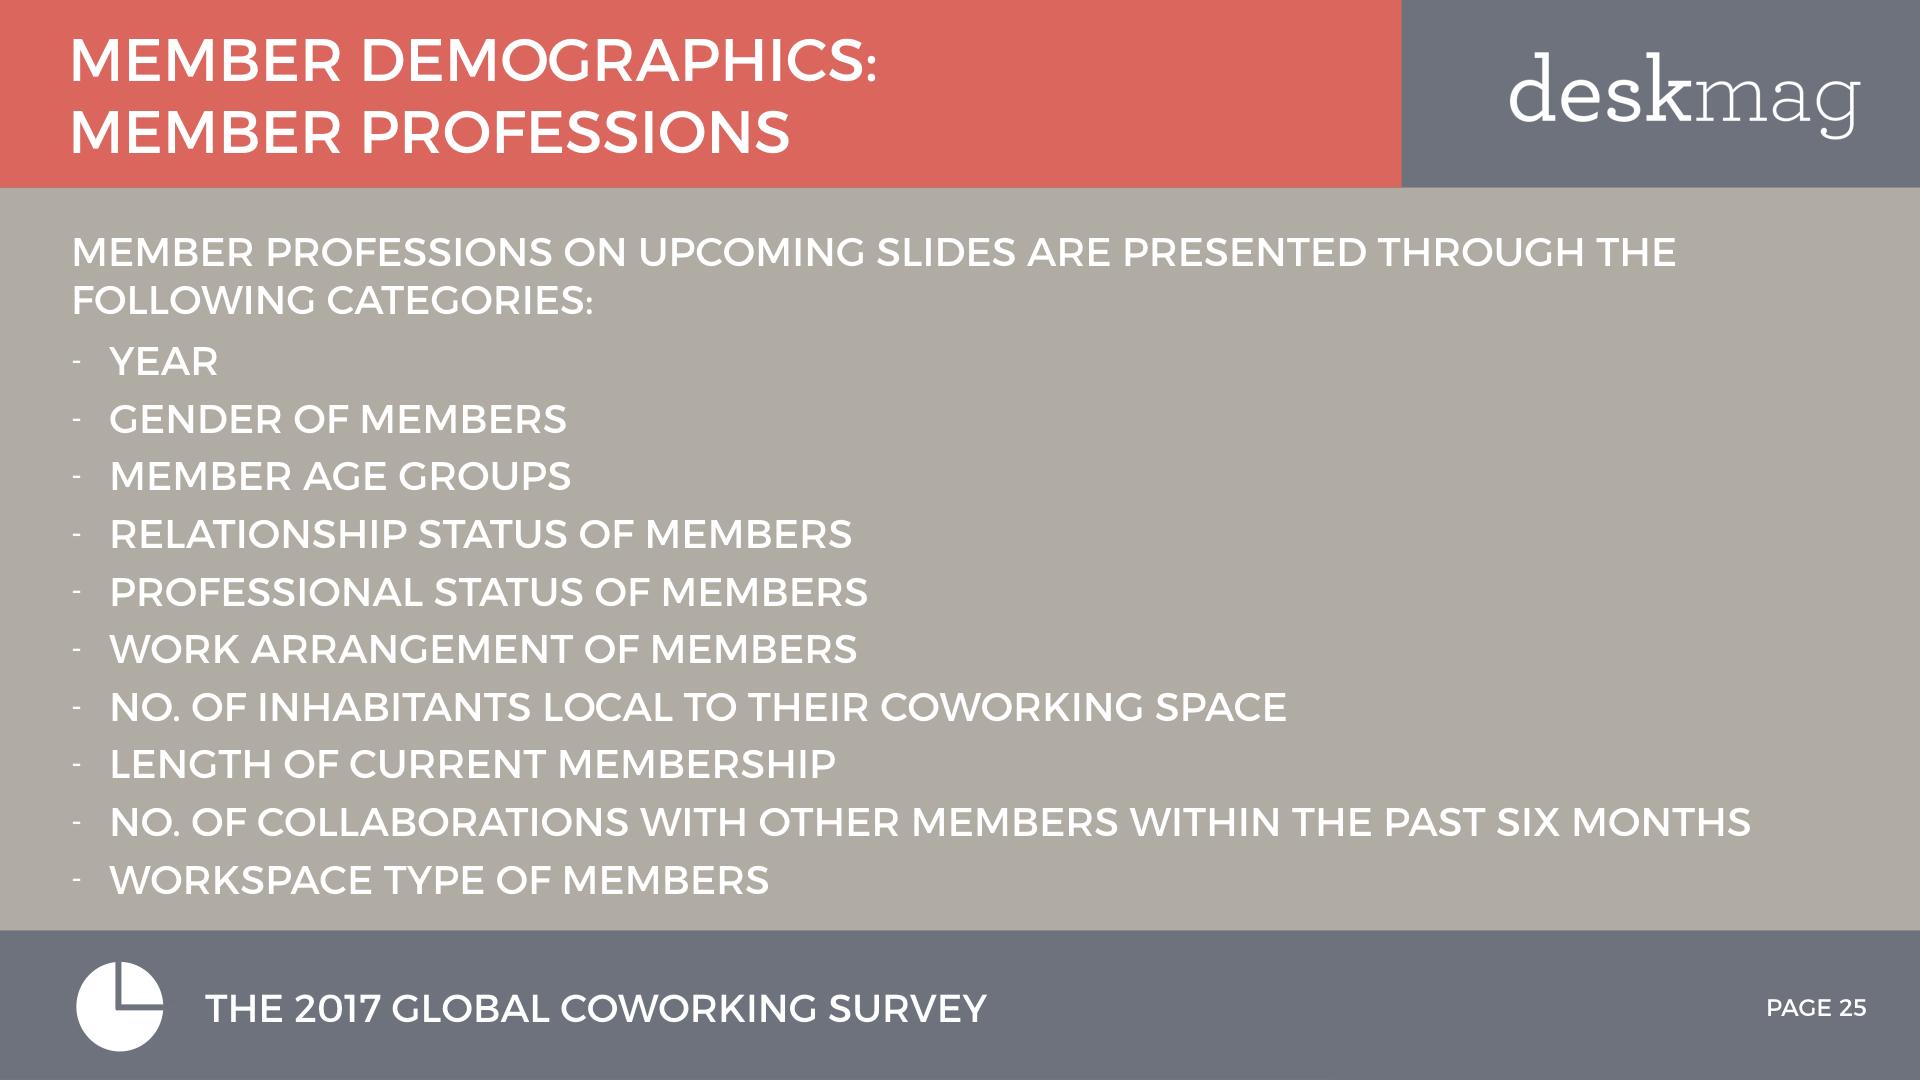 Members Of Coworking Spaces - Global Coworking Survey 2017 All Slides DEMOGRAPHICS.025.jpeg